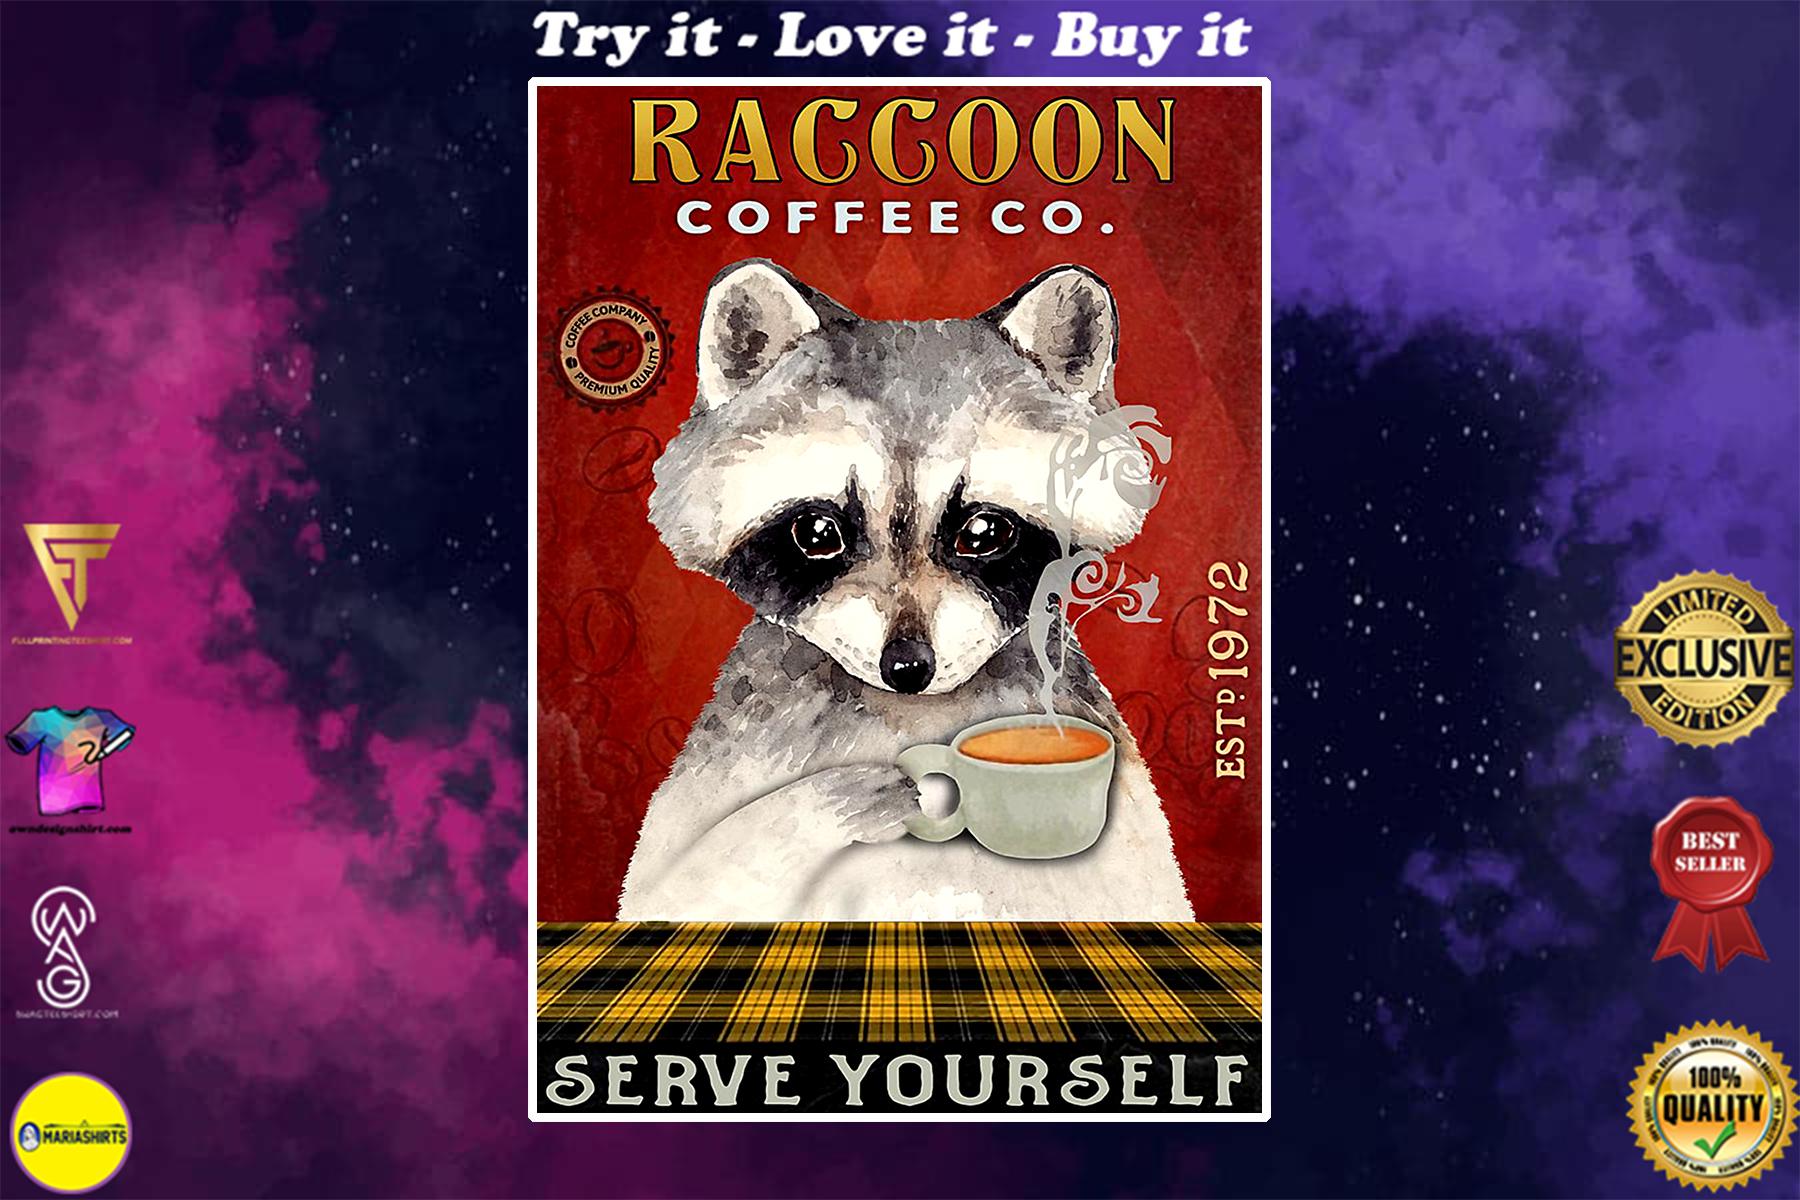 raccoon coffee company serve yourself vintage poster